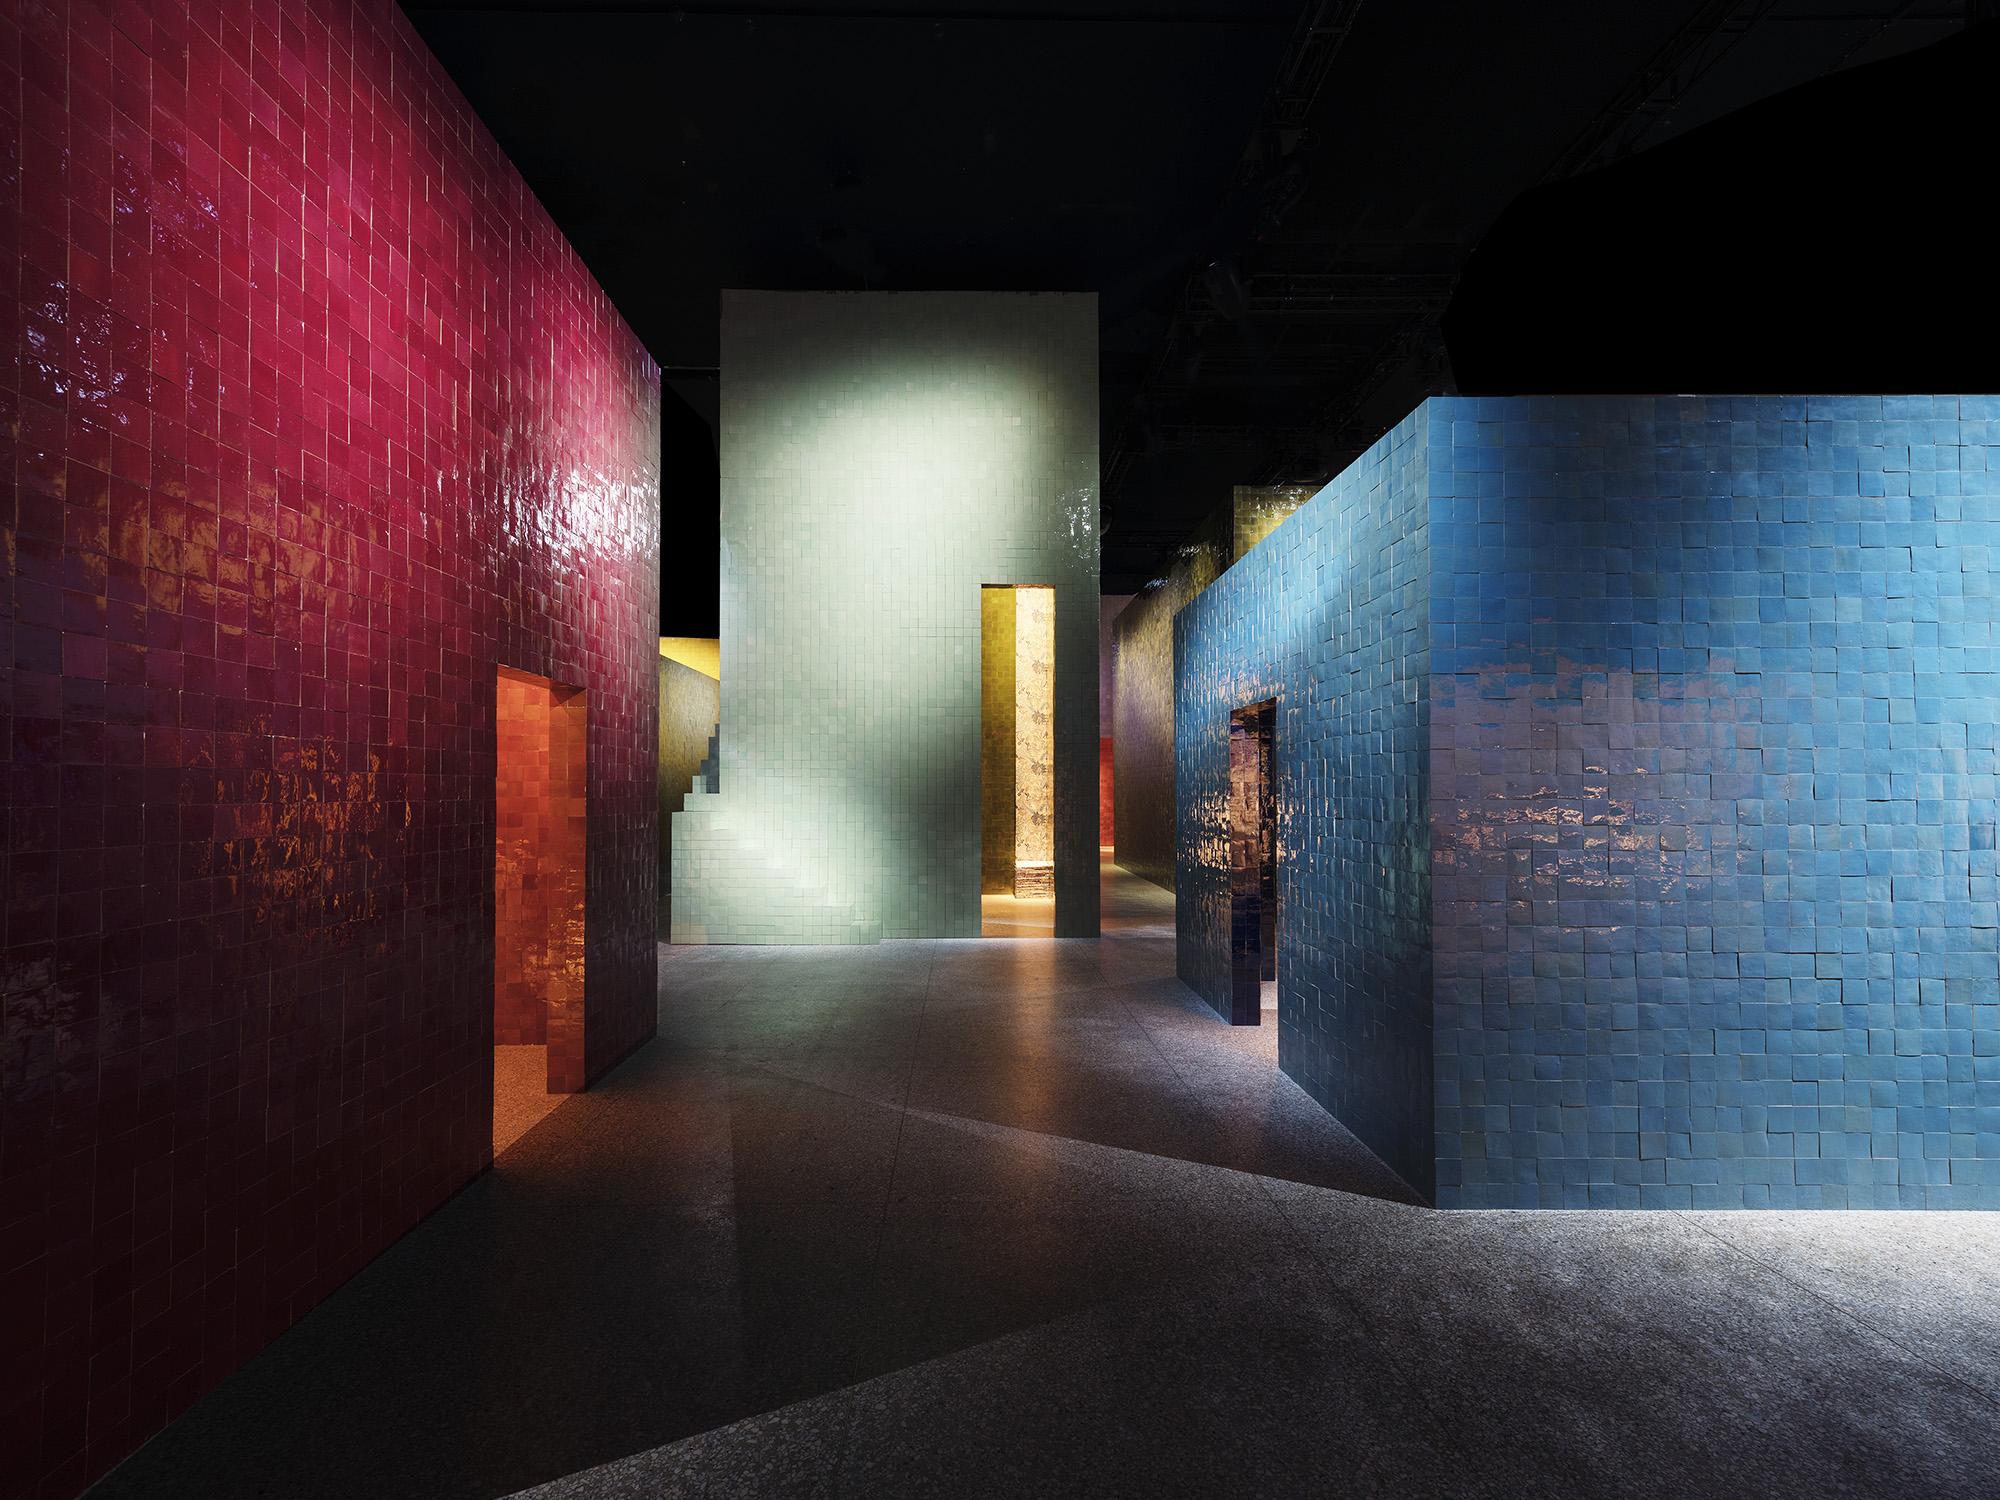 pavillon-hermes-2018-image9